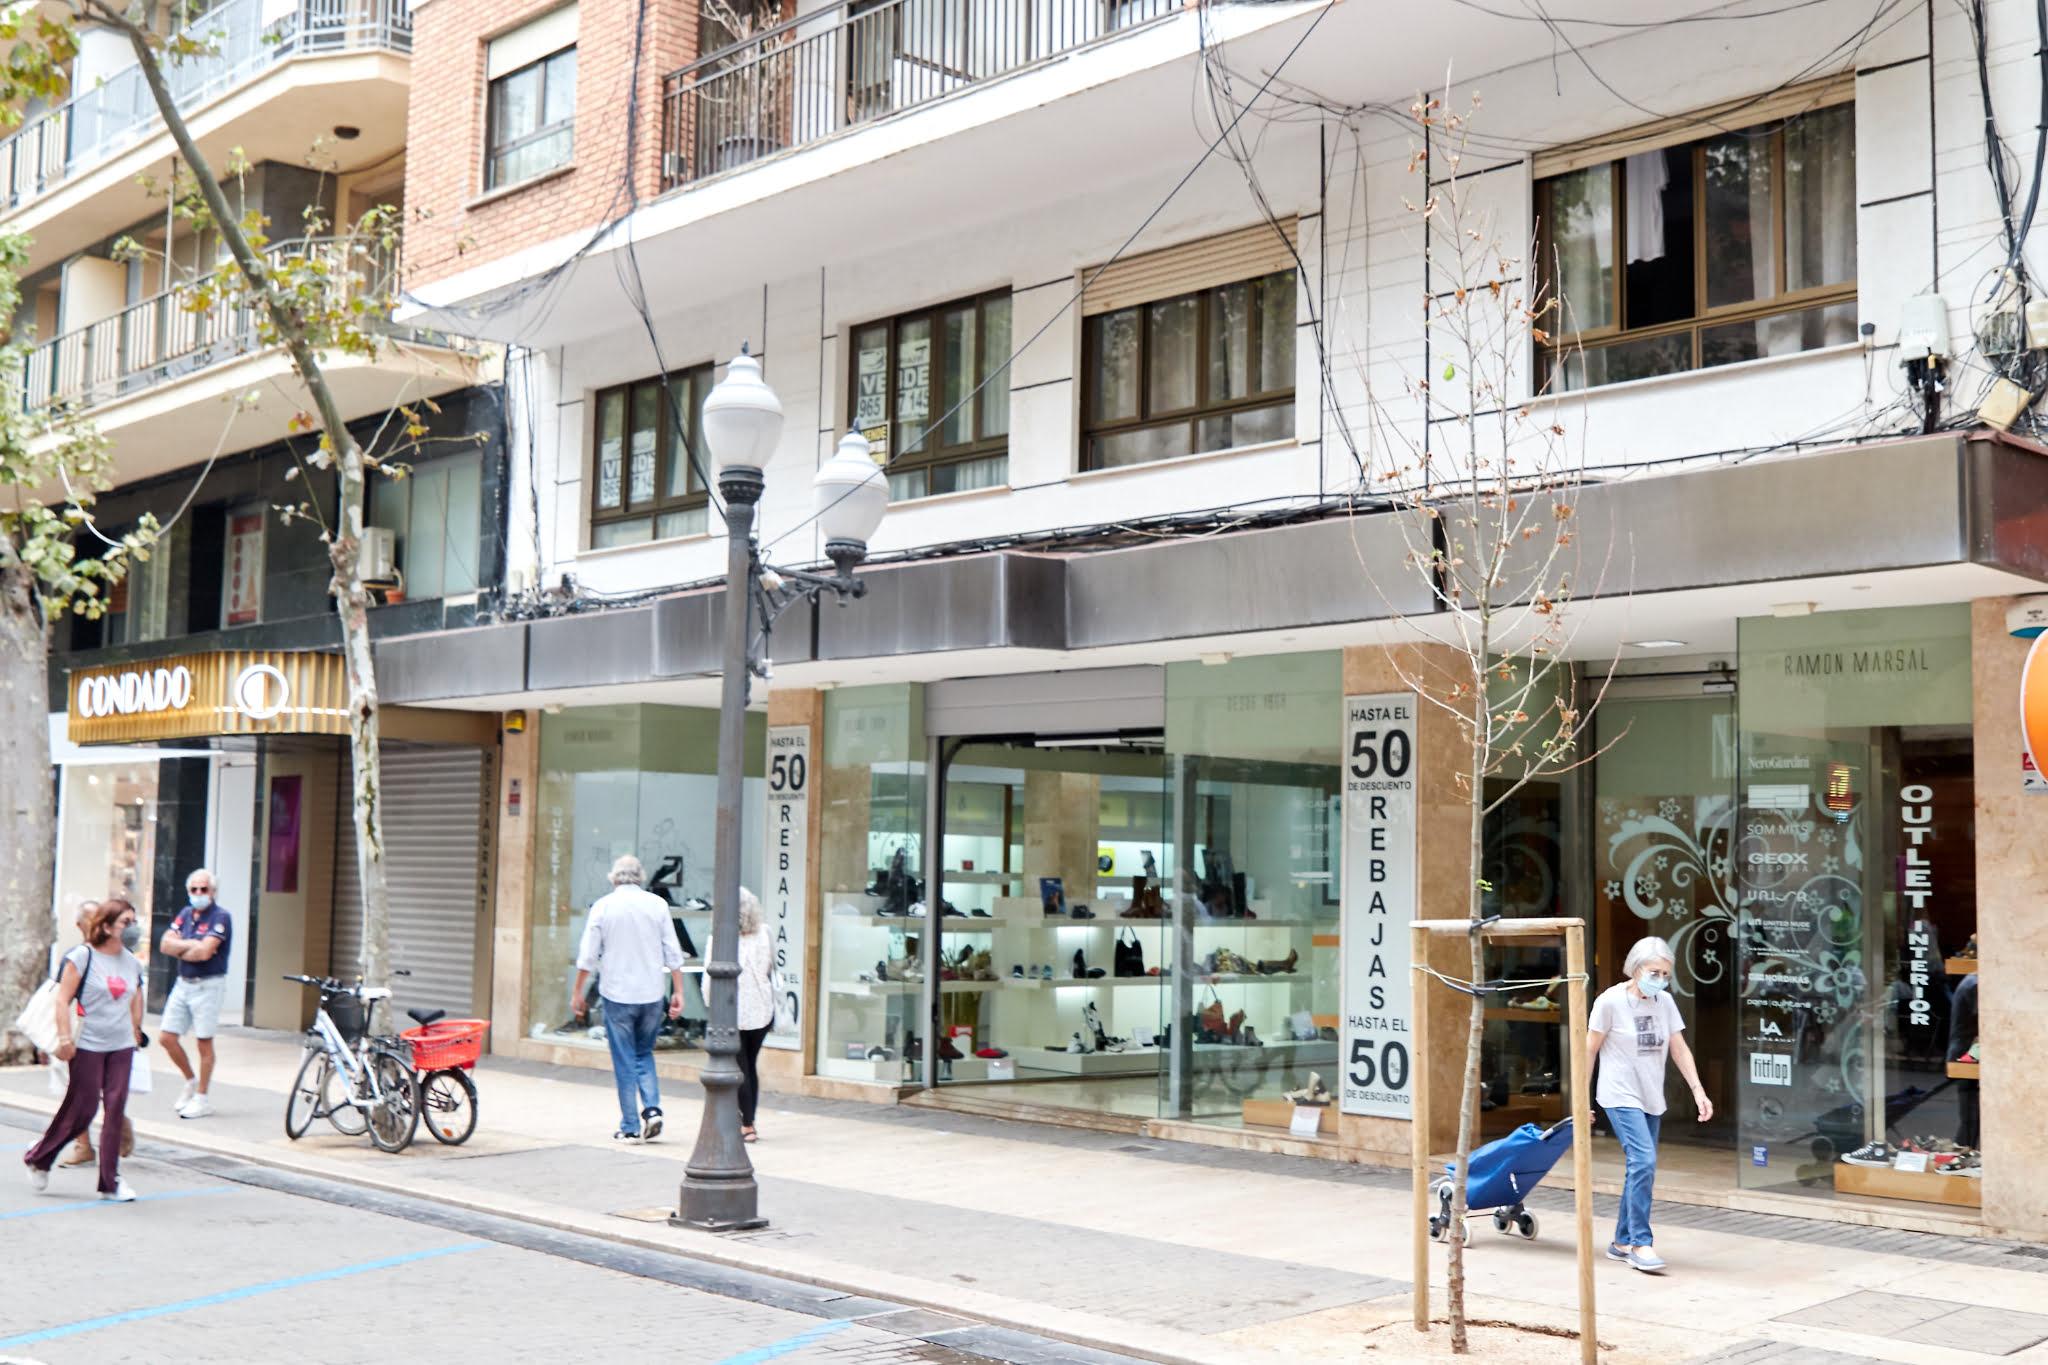 Tienda Calzados Ramón Marsal